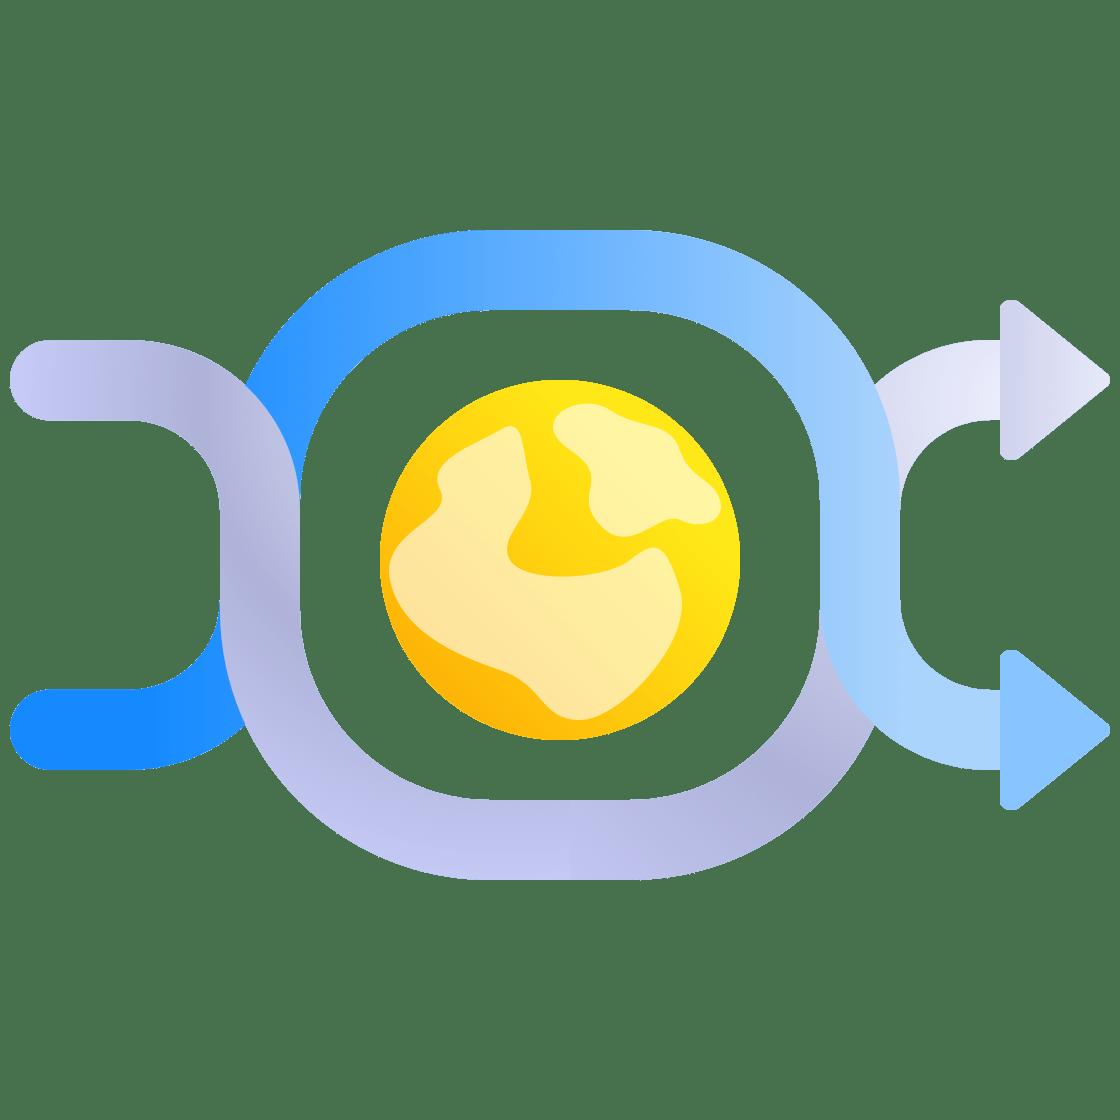 Gestione flusso documenti